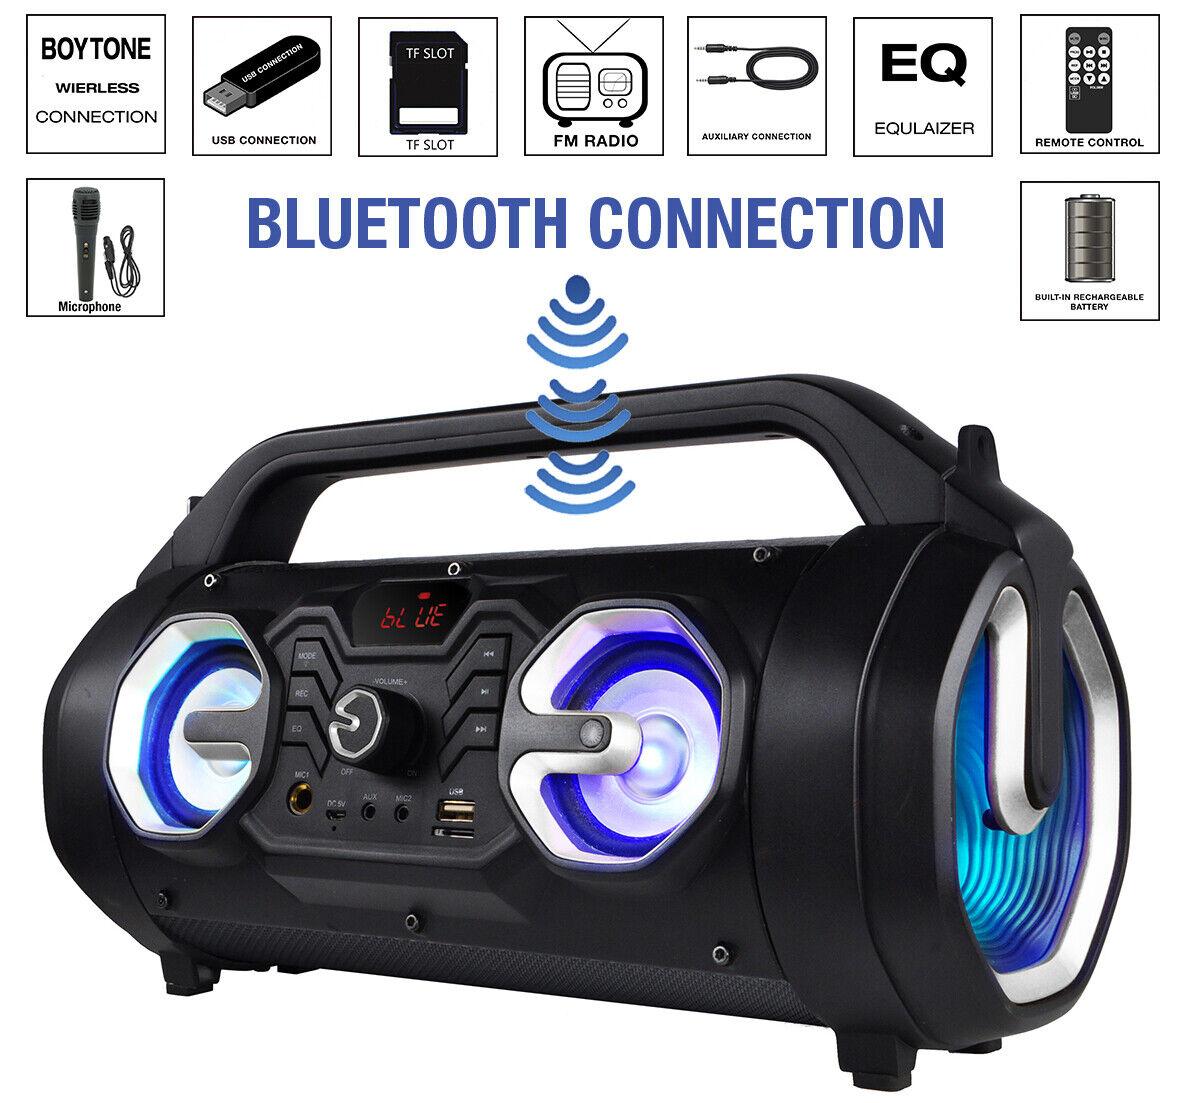 New Boytone BT-16S Portable Bluetooth Boombox Speaker, Indoo